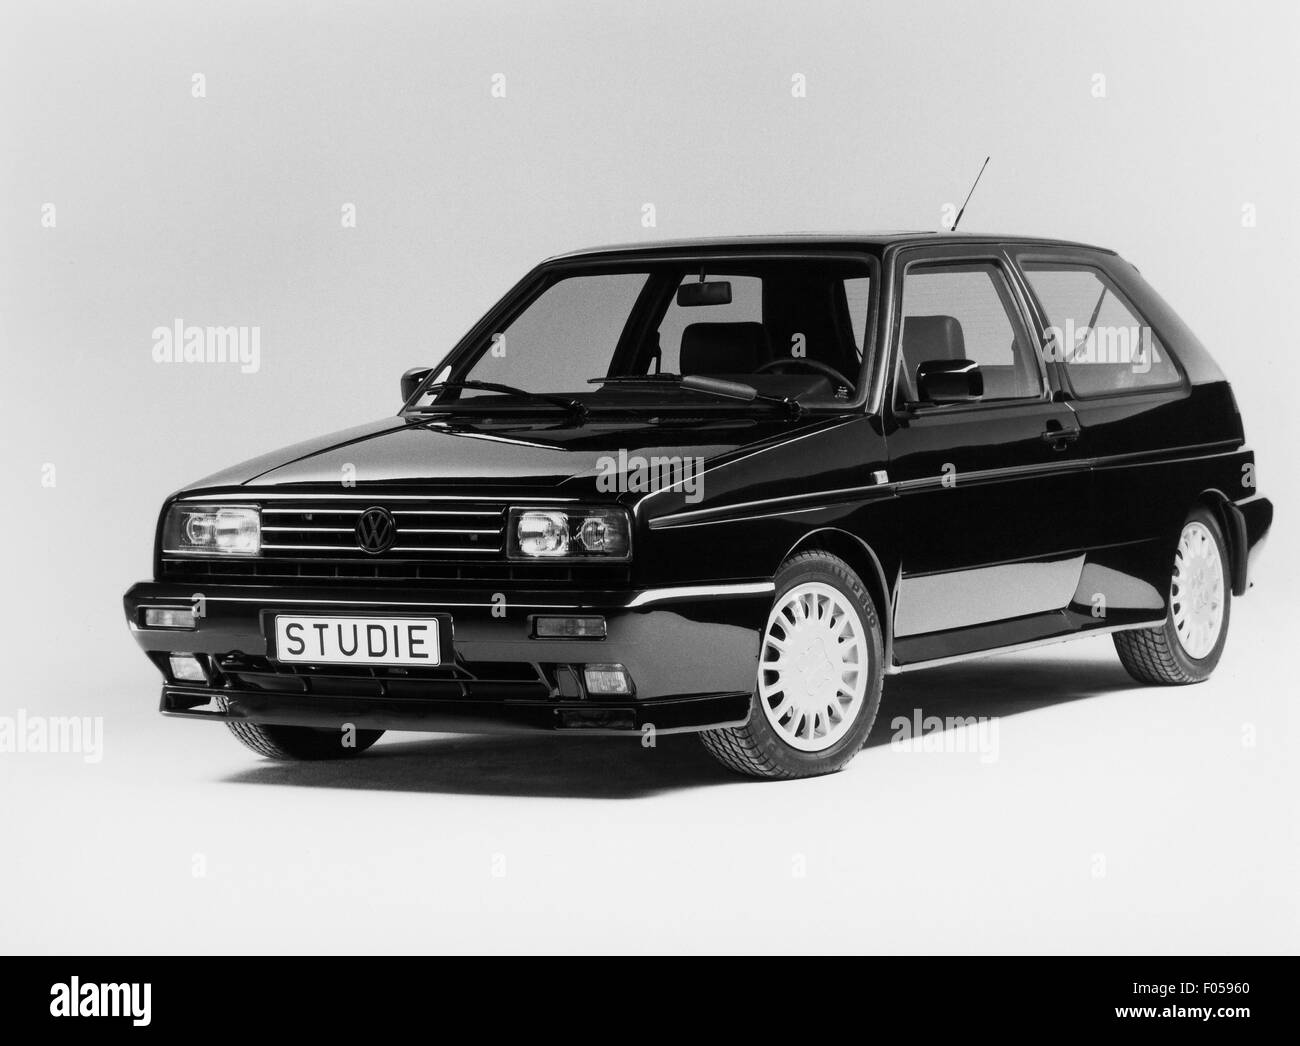 transport / transportation, car, vehicle variants, Volkswagen, VW Golf concept vehicle, 1980s, Additional-Rights - Stock Image